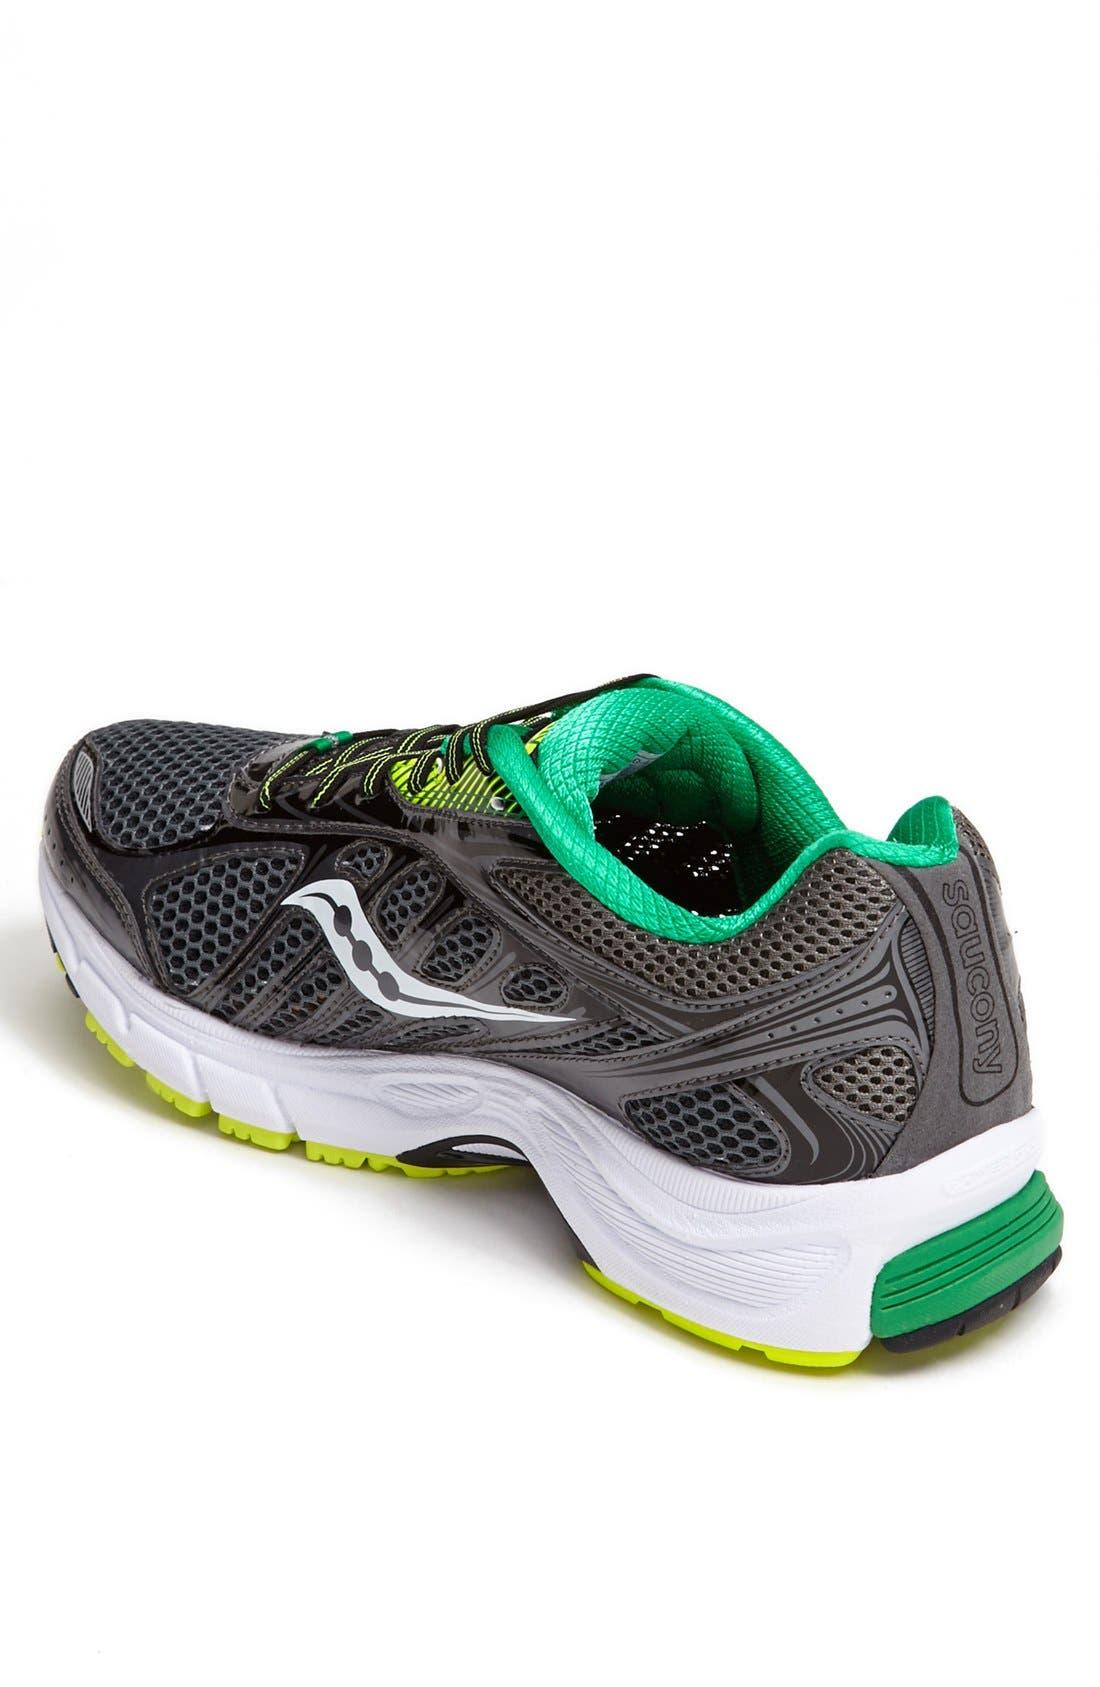 Alternate Image 2  - Saucony 'Ride 6' Running Shoe (Men)